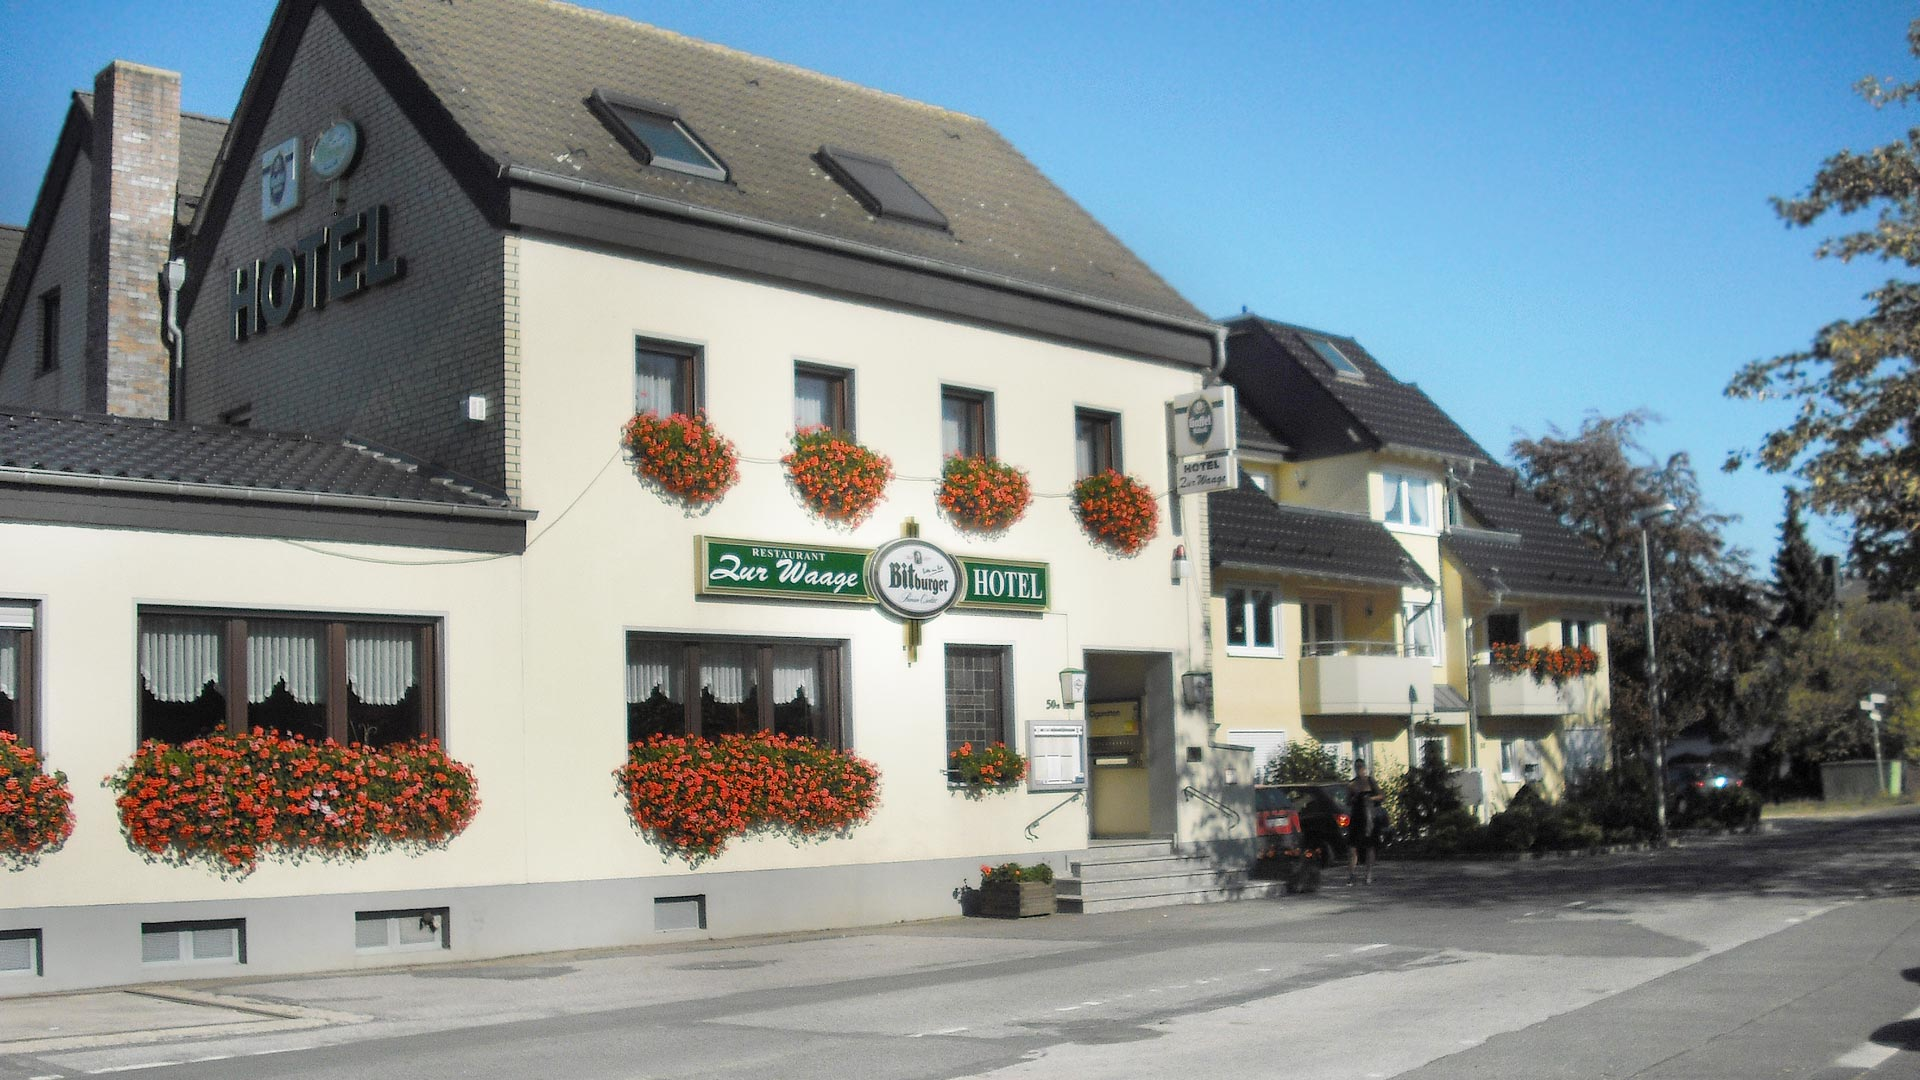 https://www.hotelzurwaage.de/wp-content/uploads/2019/01/Hotel-Bilder-300x225.jpg